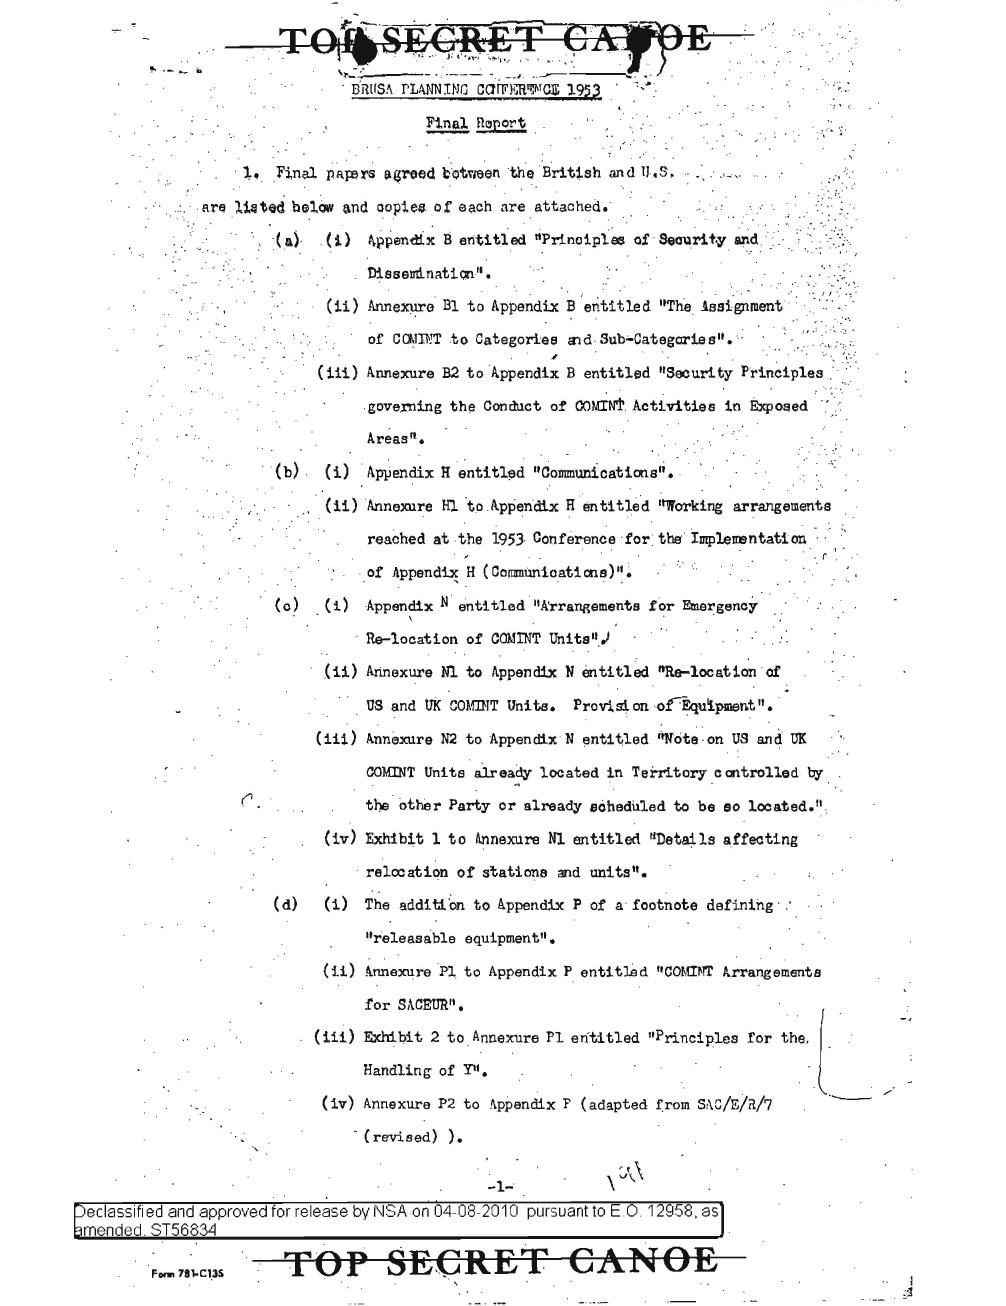 BRUSA_FINAL_REP_1953.PDF